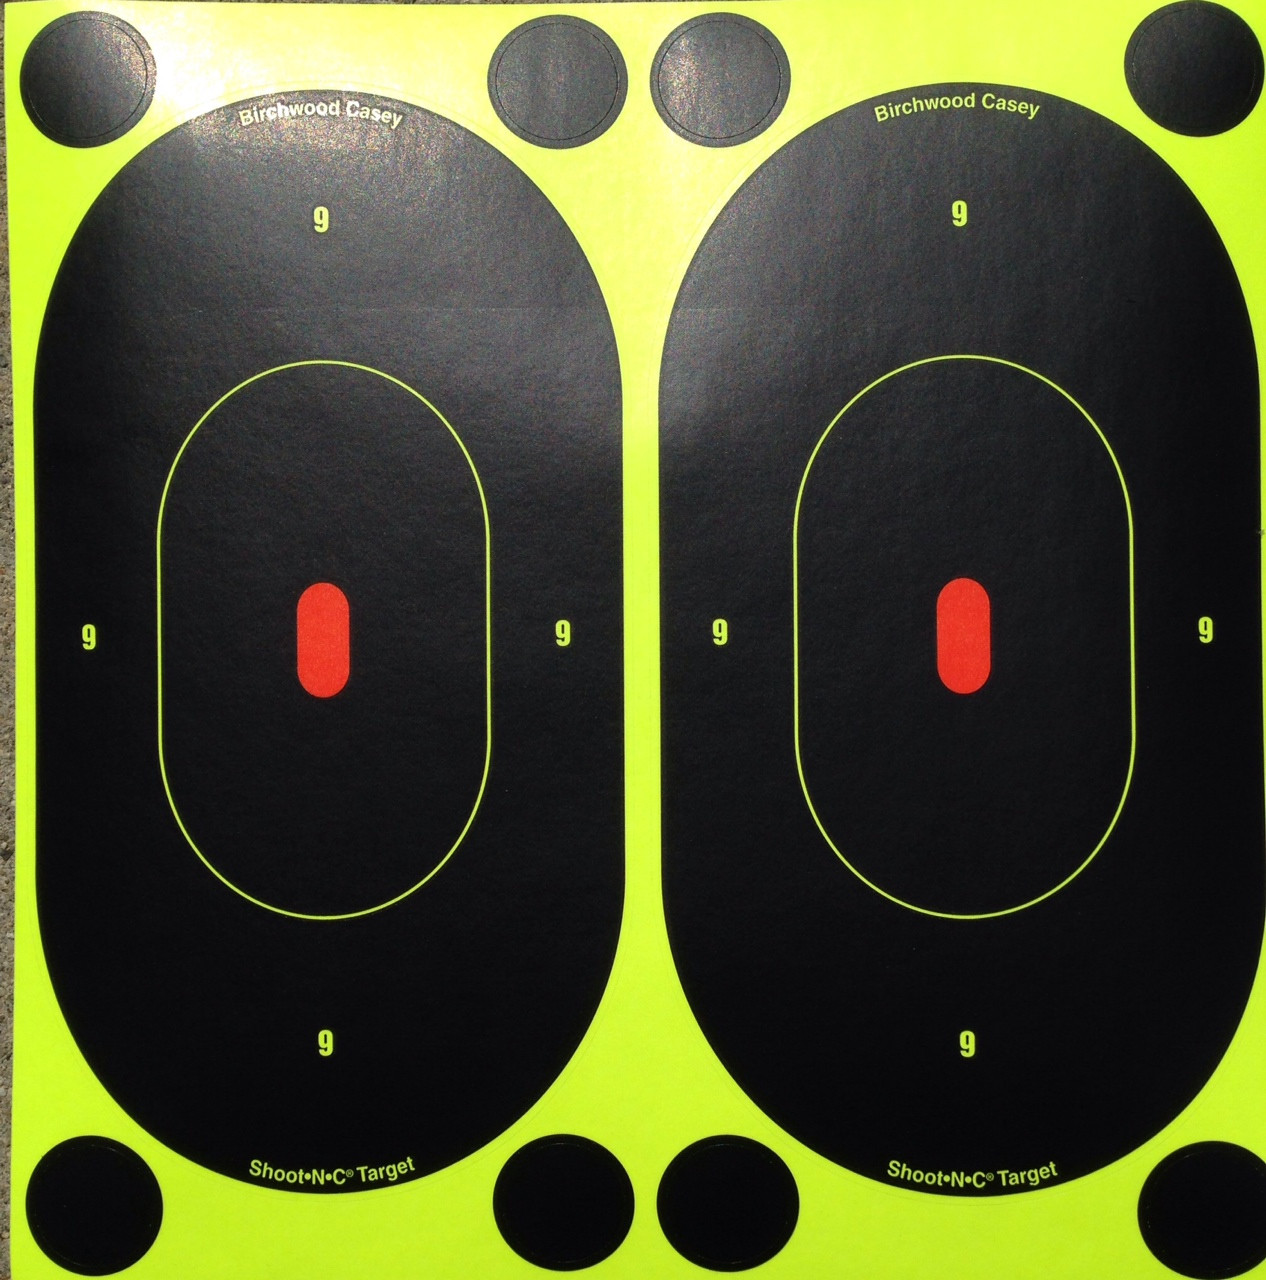 "Shoot-N-C 7"" Oval Reactive Shooting Target"